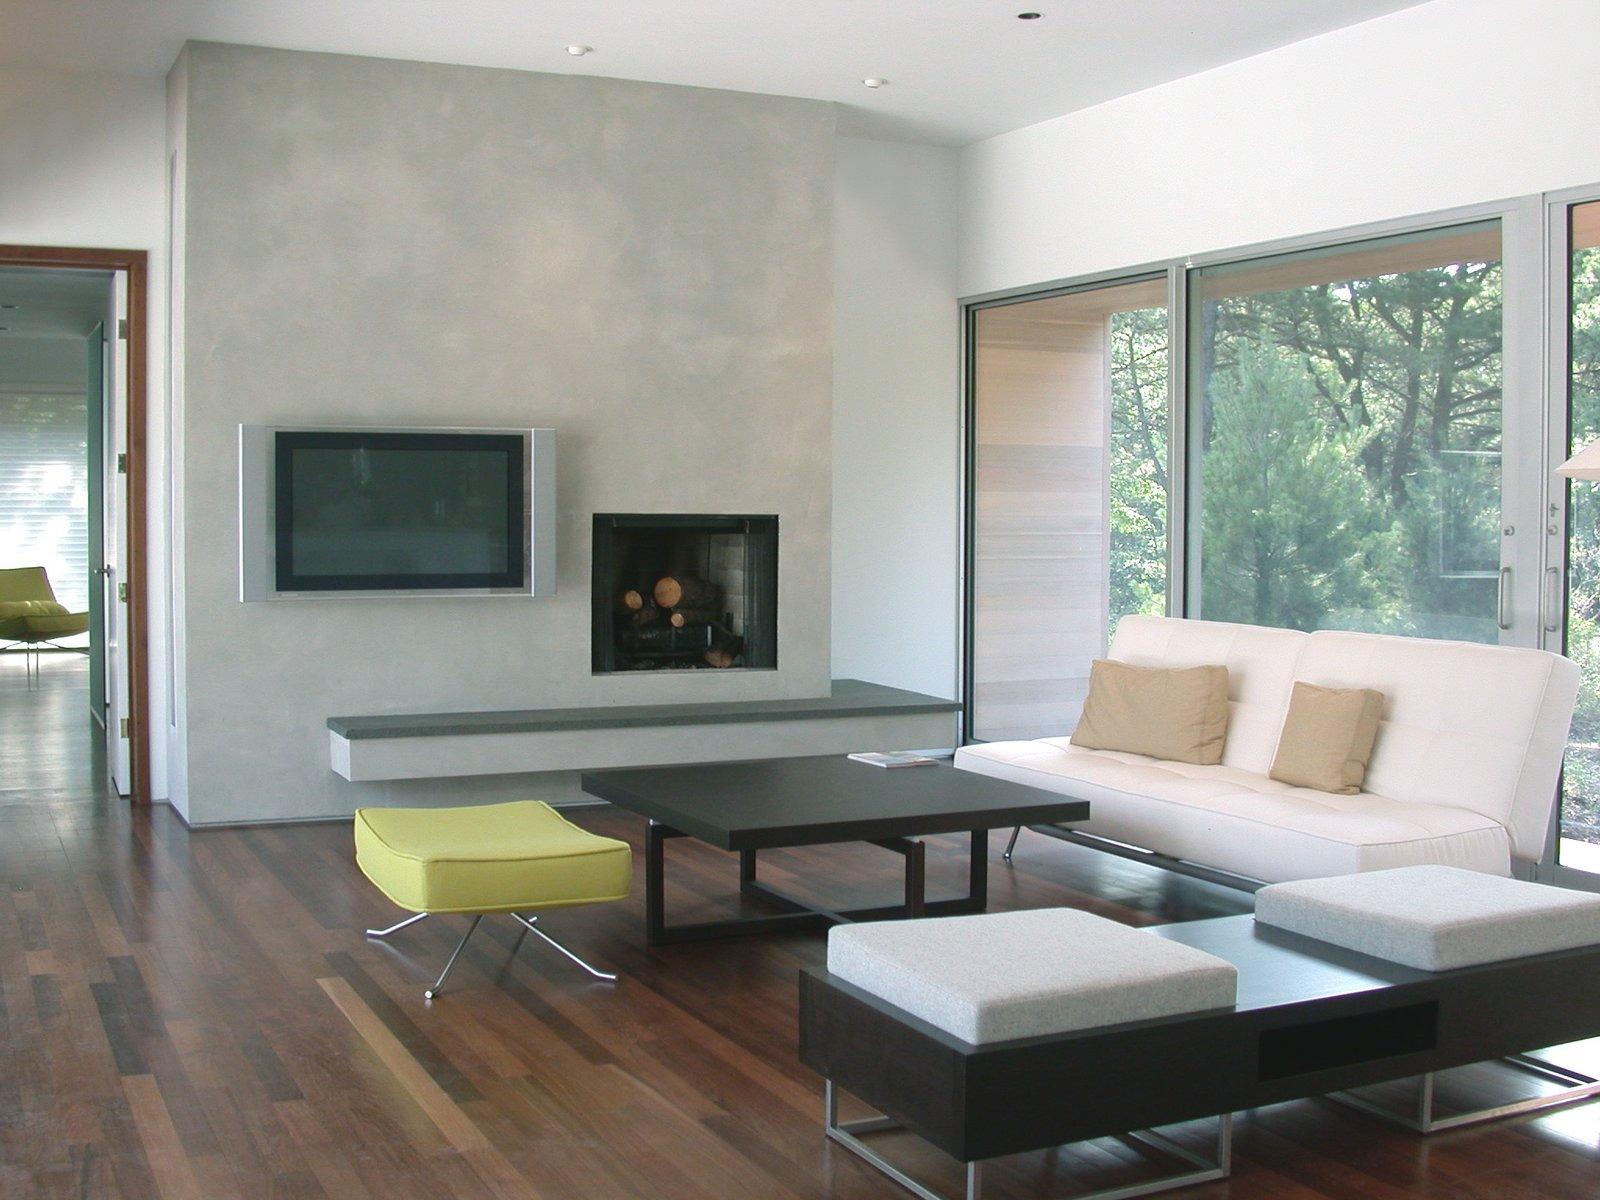 Tagged: Living Room, Sofa, Ceiling Lighting, Coffee Tables, Wood Burning Fireplace, Medium Hardwood Floor, and Chair.  Sagaponac House by Hariri & Hariri Architecture